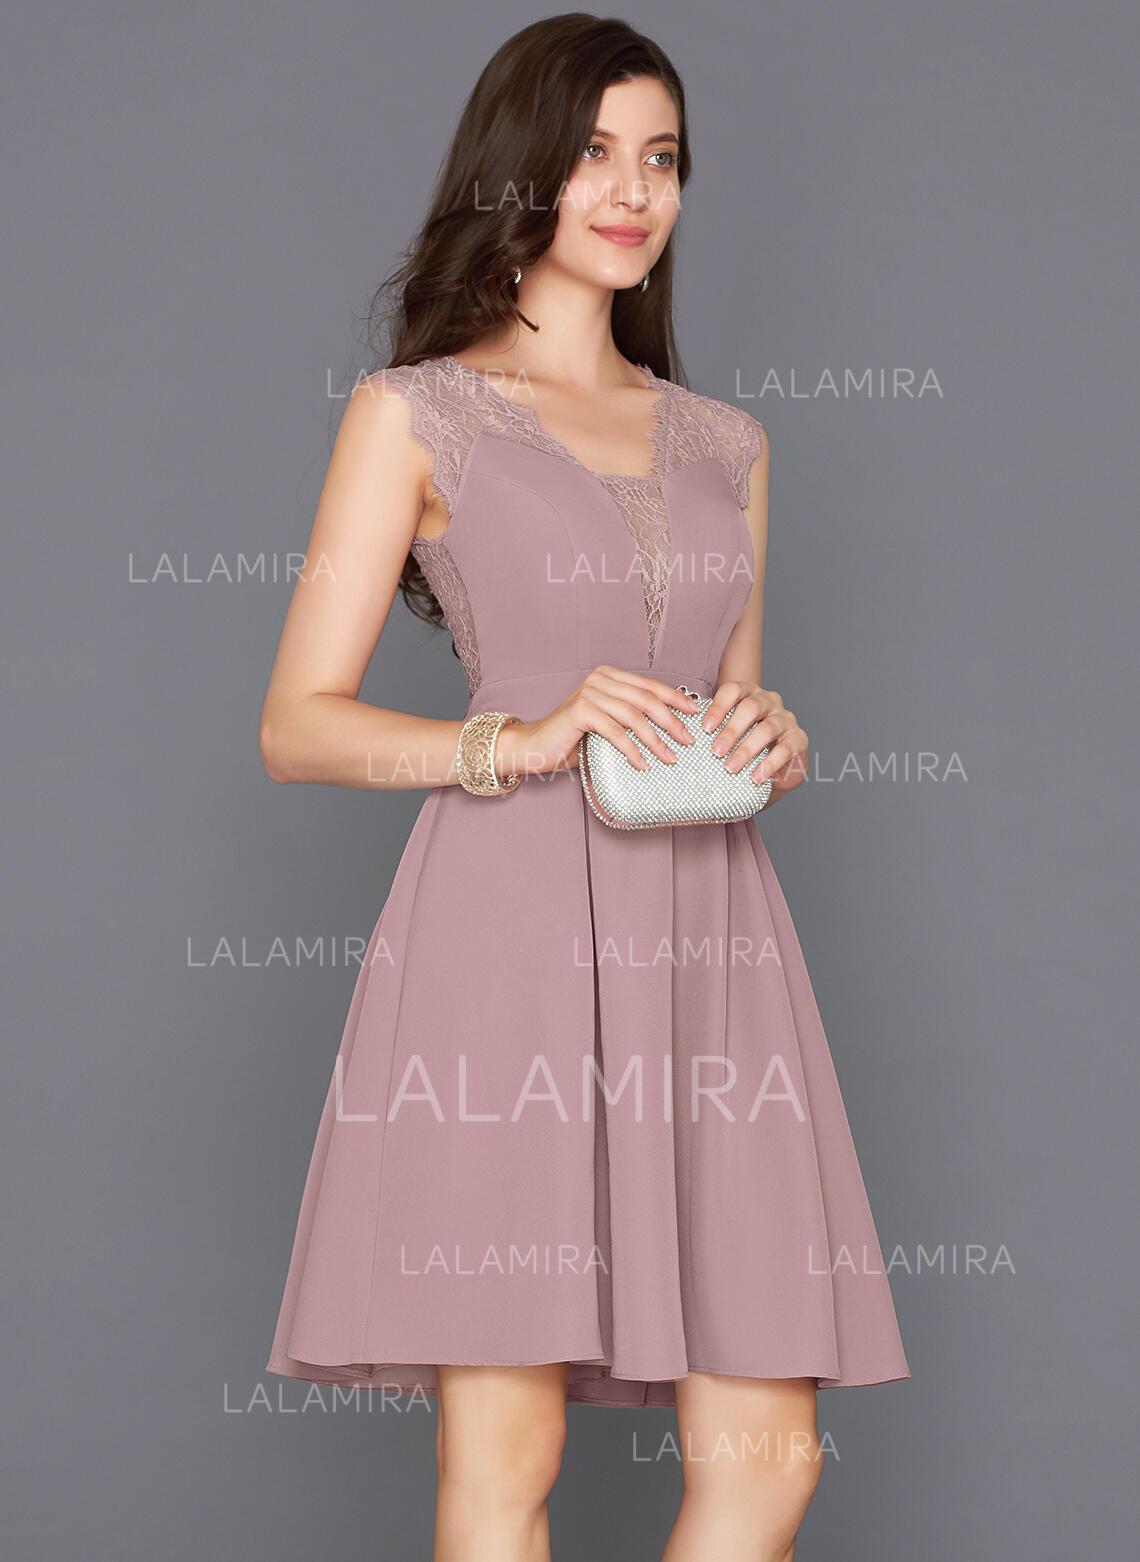 a61419687c 2019 New Satin Homecoming Dresses A-Line Princess Knee-Length V-neck. Loading  zoom